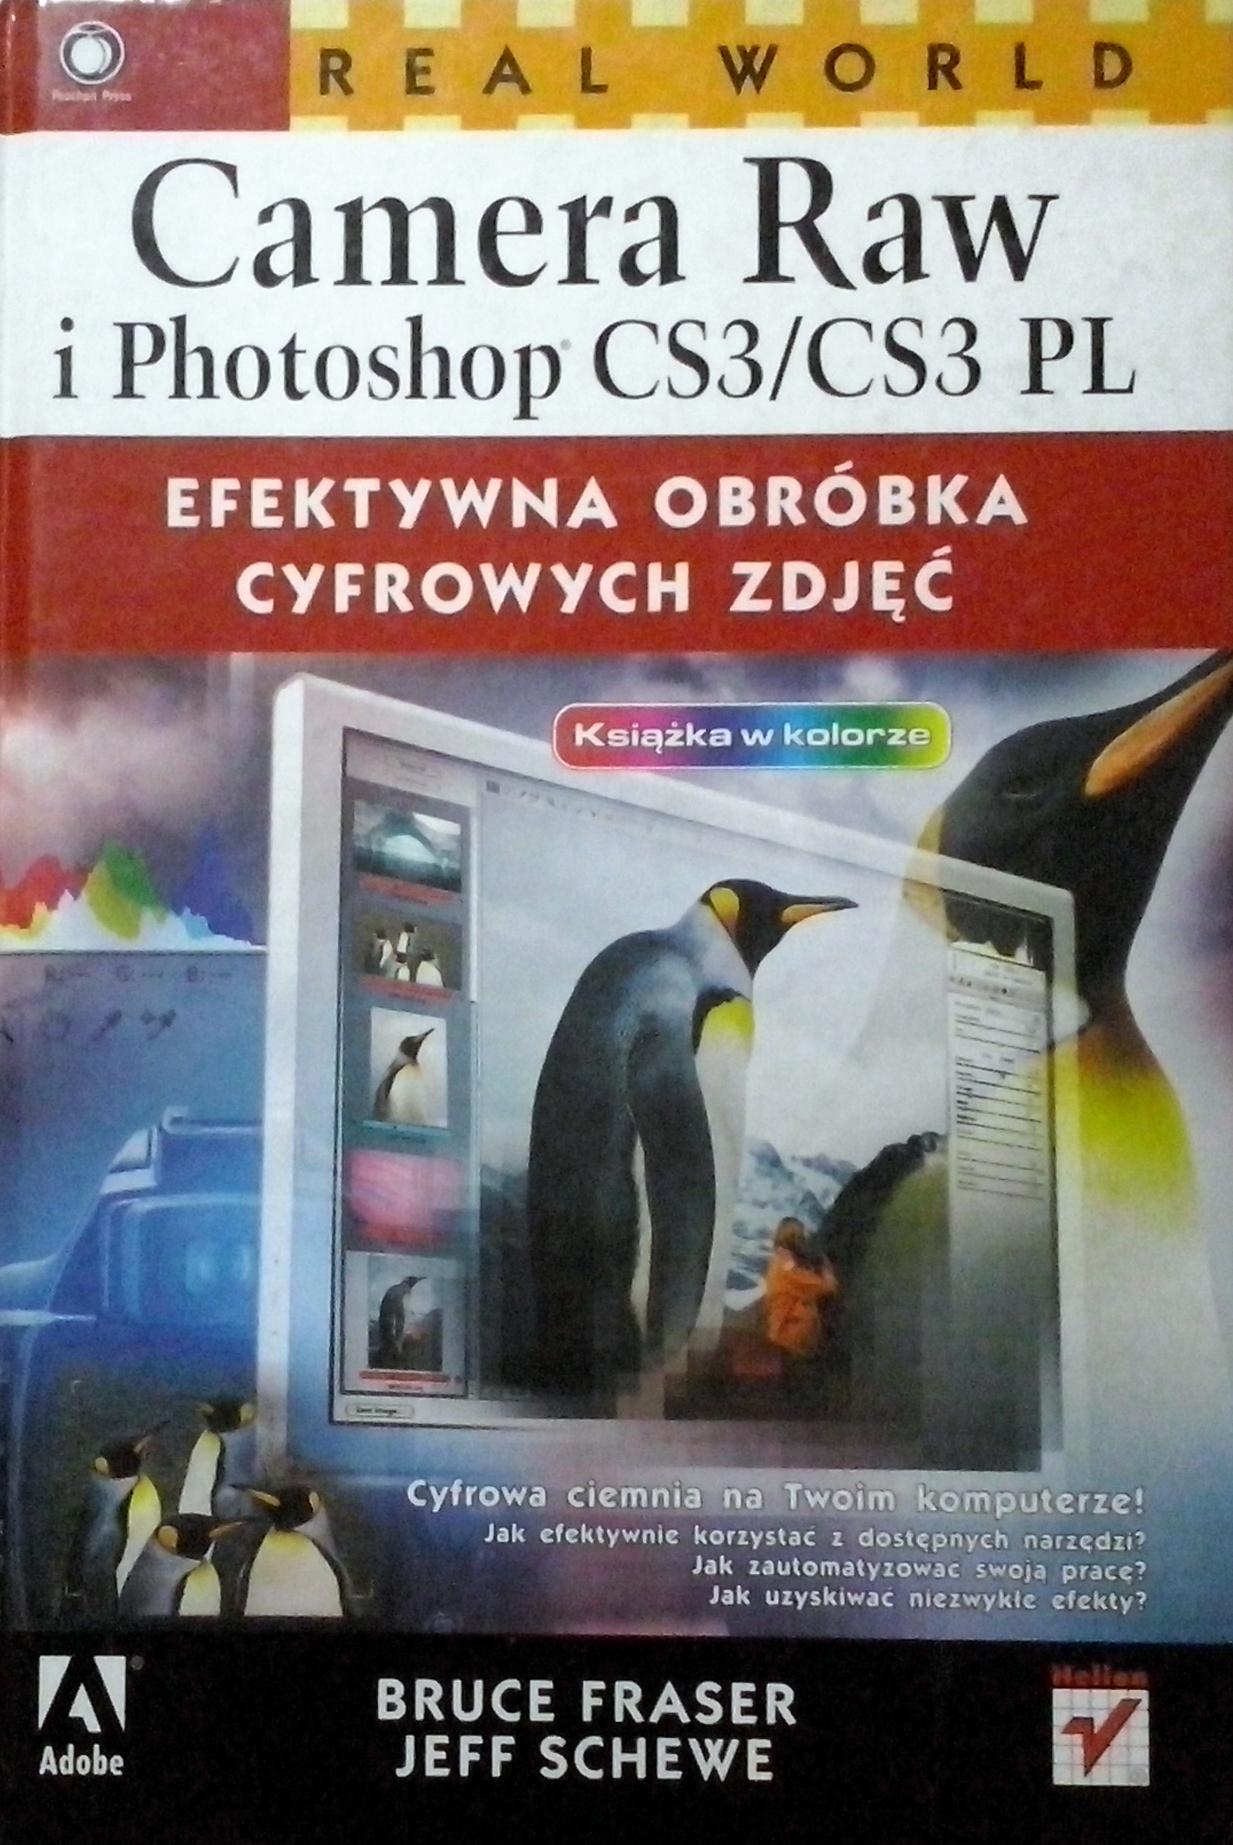 CAMERA RAW I PHOTOSHOP CS3/CS3 PL. FRASER. AR